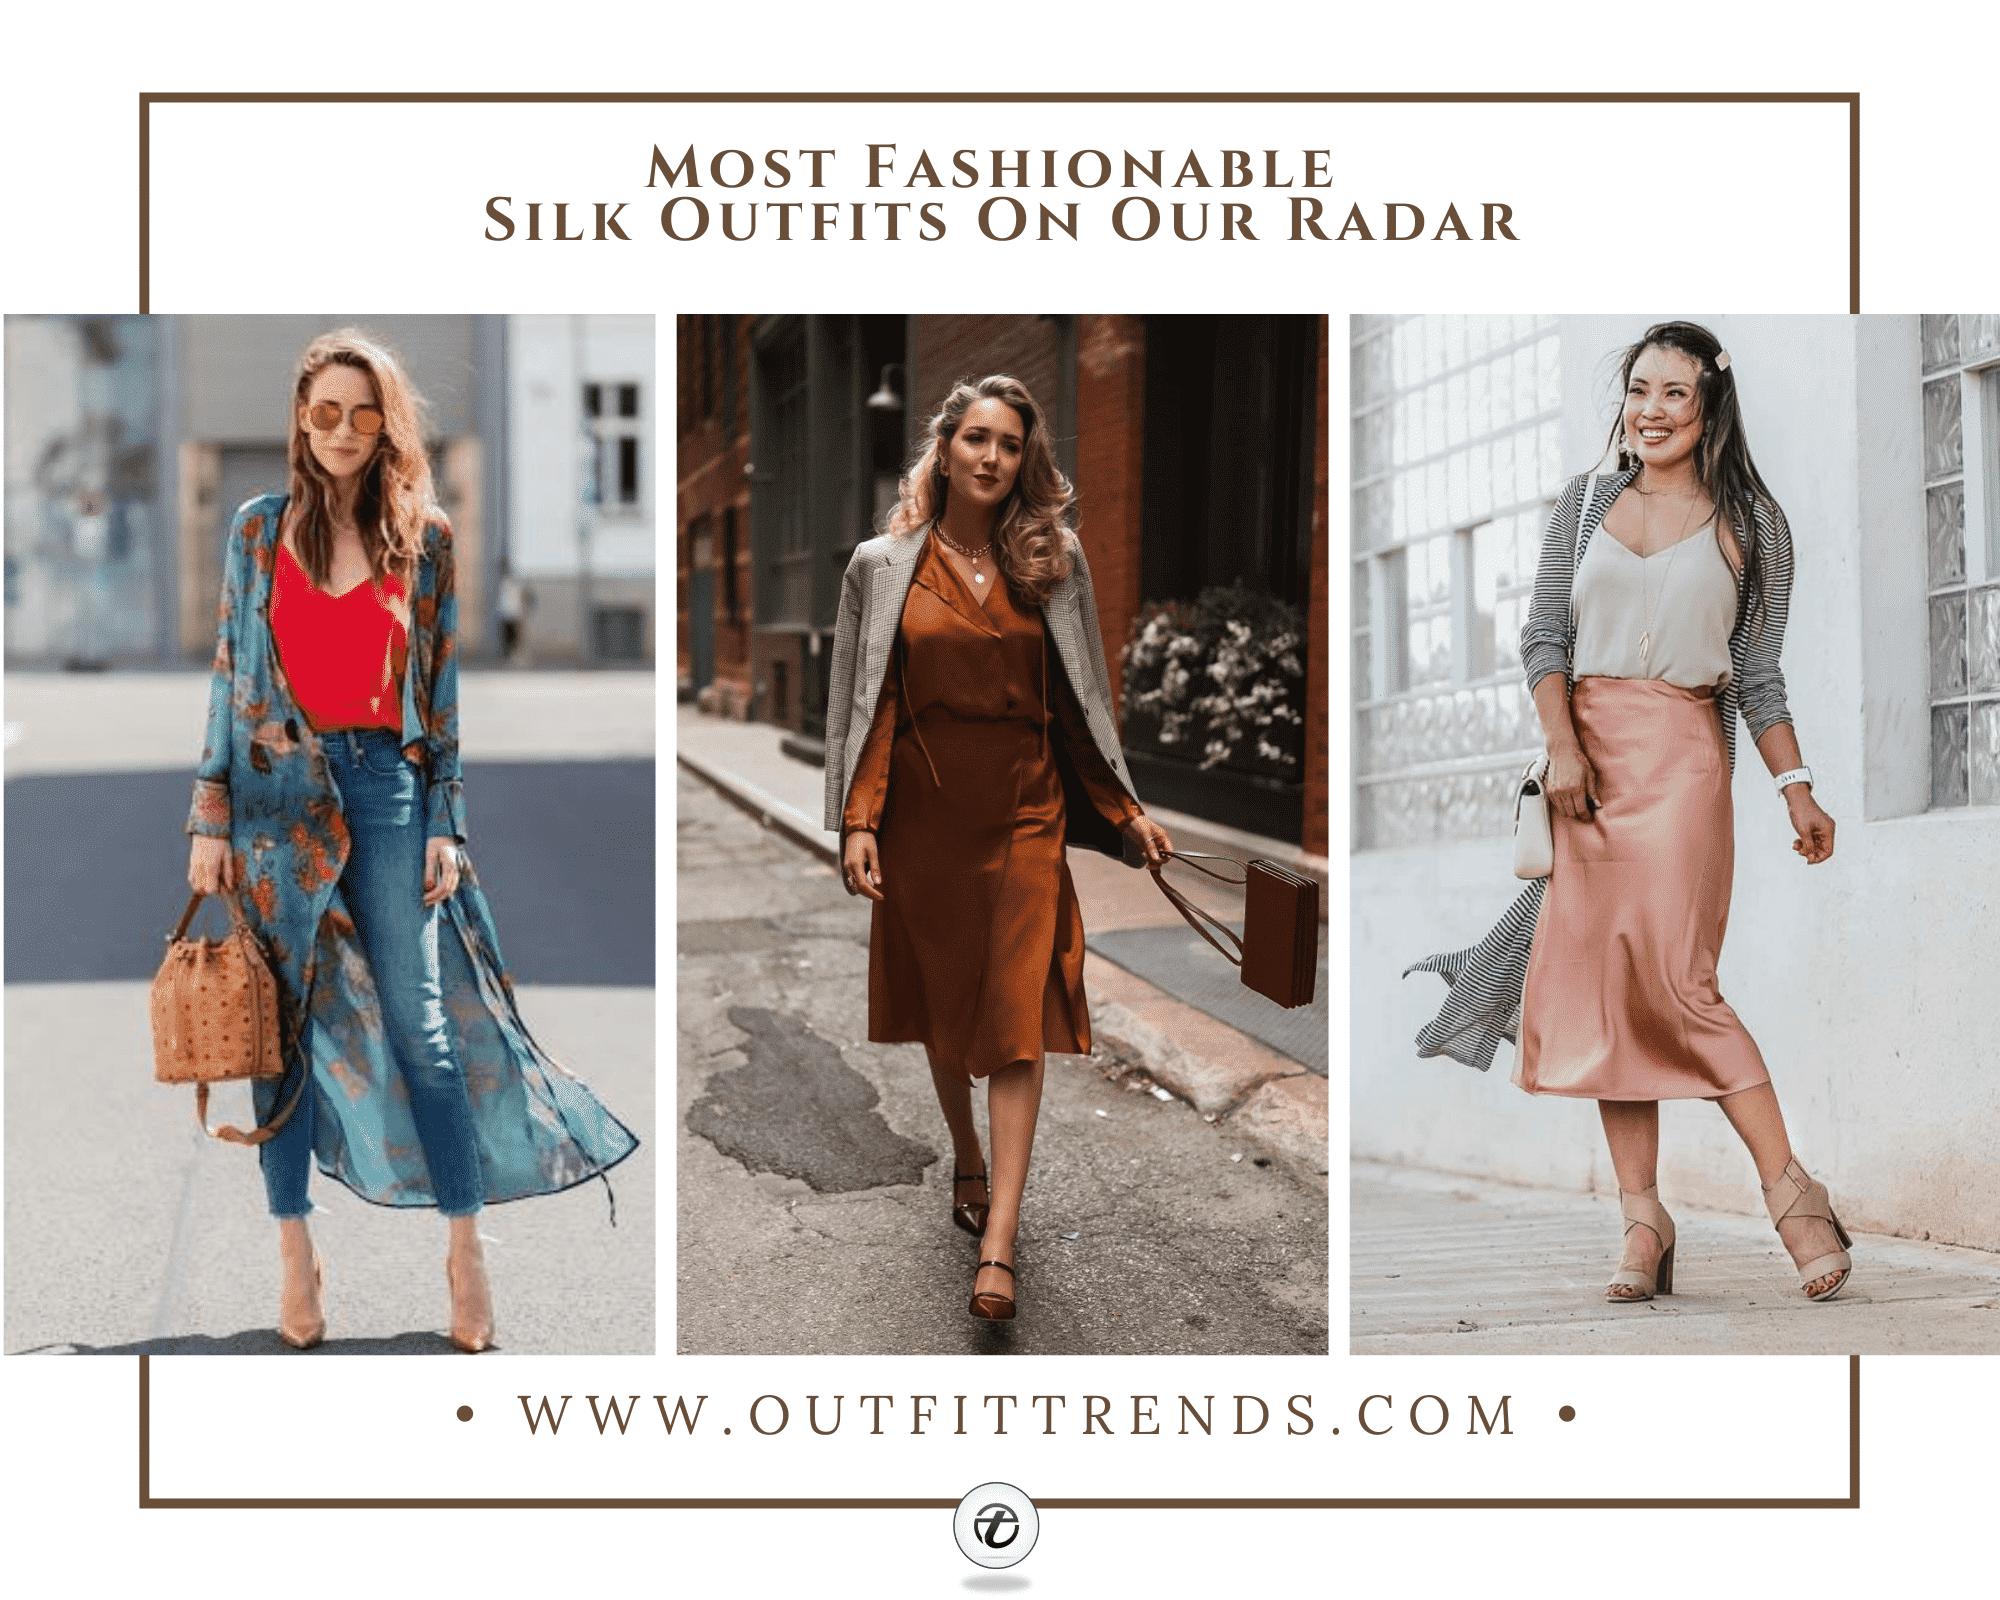 Women's Silk Outfits – 23 Best Ideas On How To Wear Silk